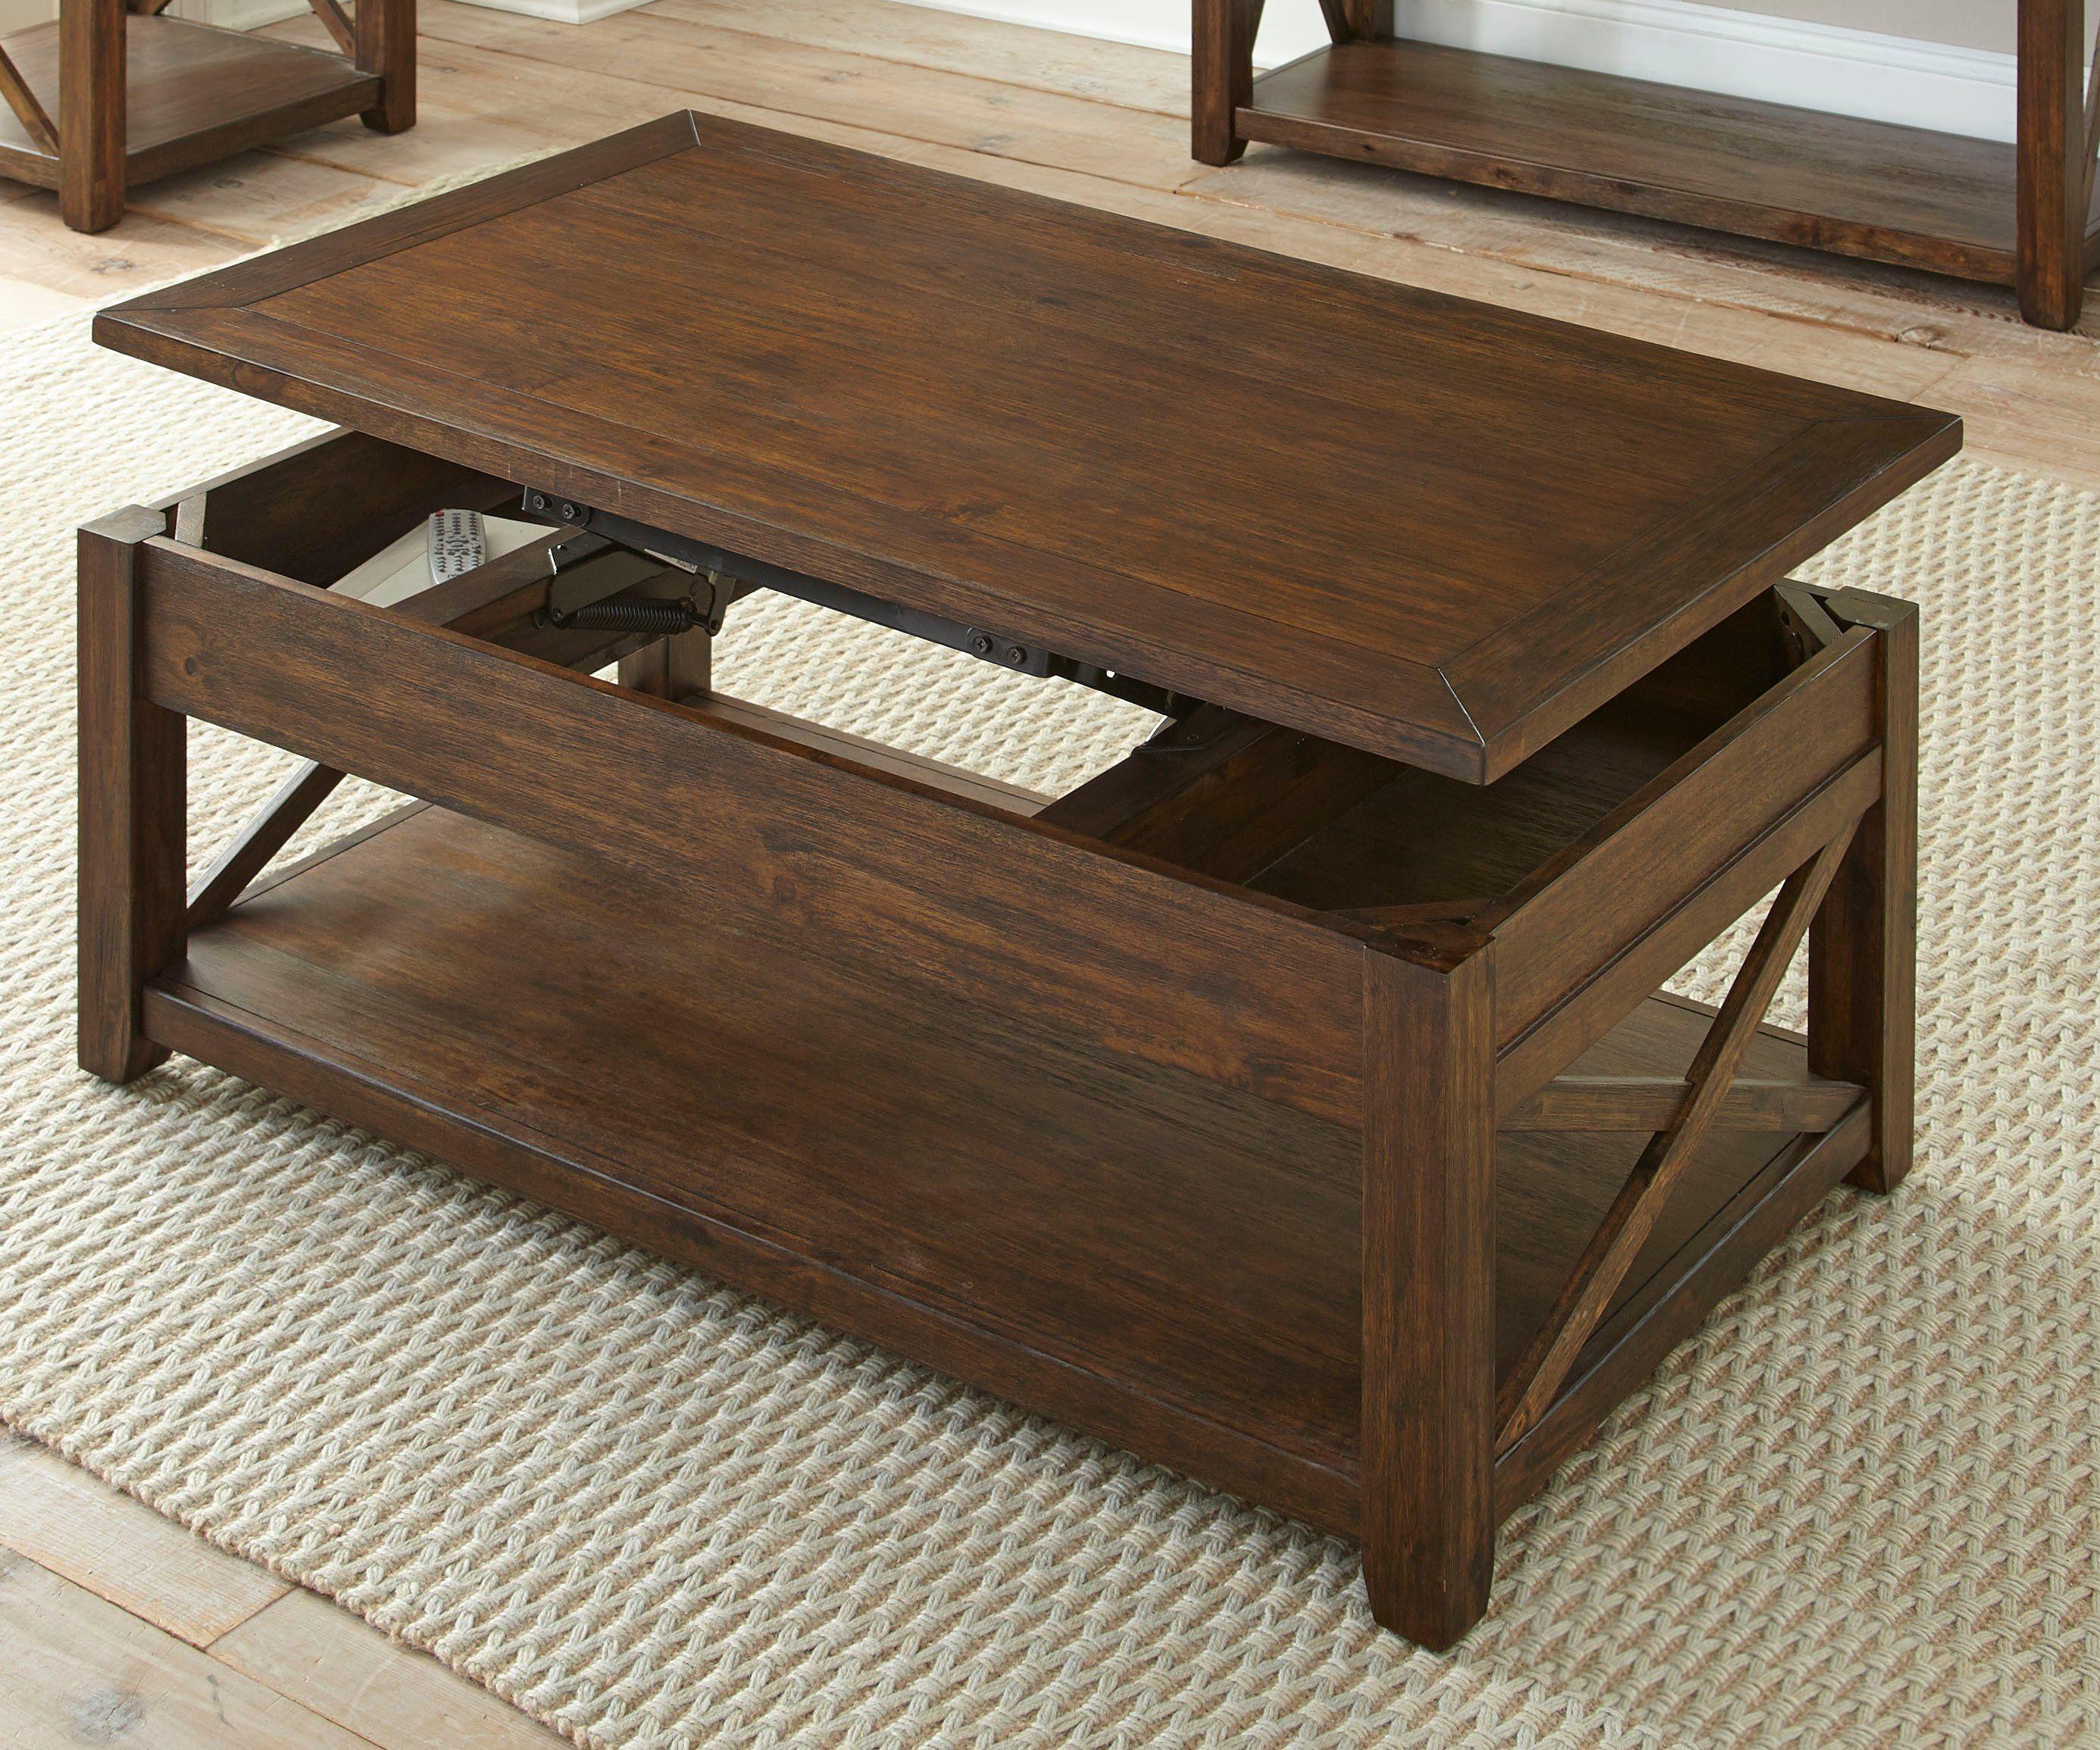 Mocha Brown Lift Top Coffee Table Lenka In 2021 Coffee Table With Casters Coffee Table Coffee Table With Storage [ 2310 x 2772 Pixel ]